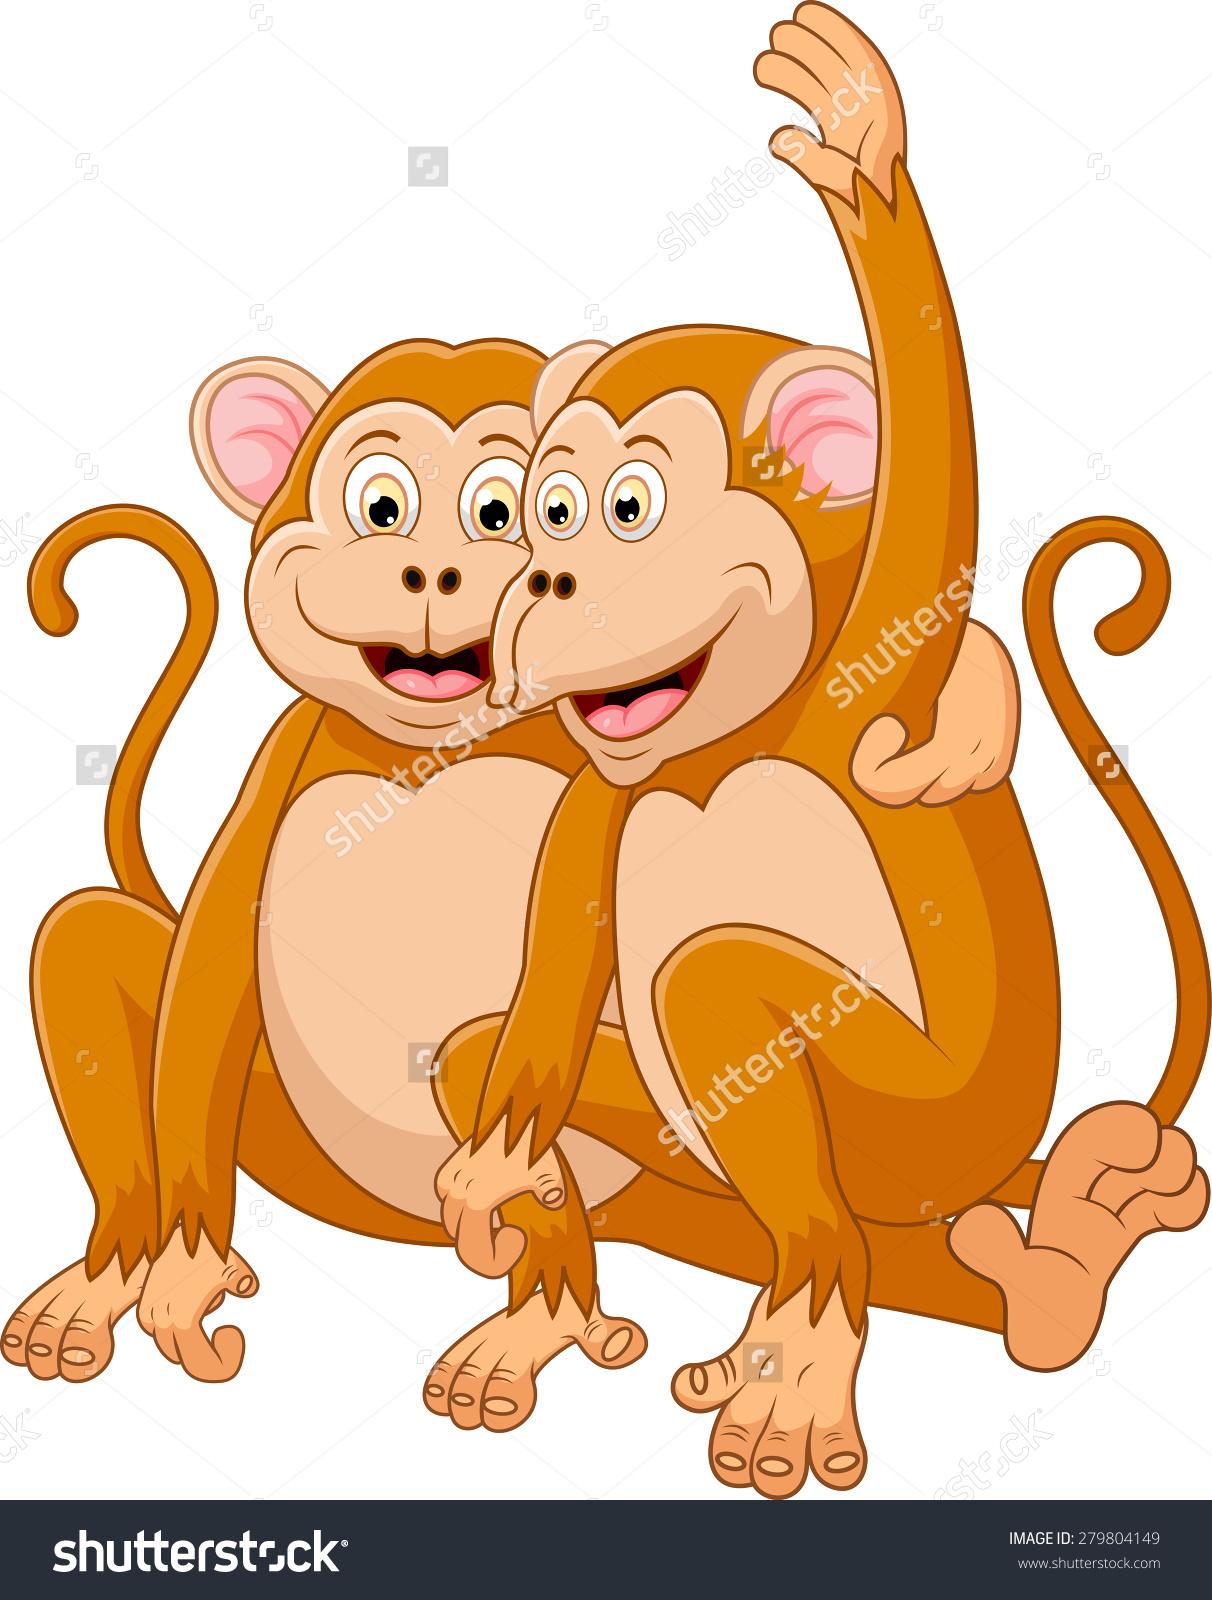 Monkey Cartoon Free Vector Art - (20971 Free Downloads)